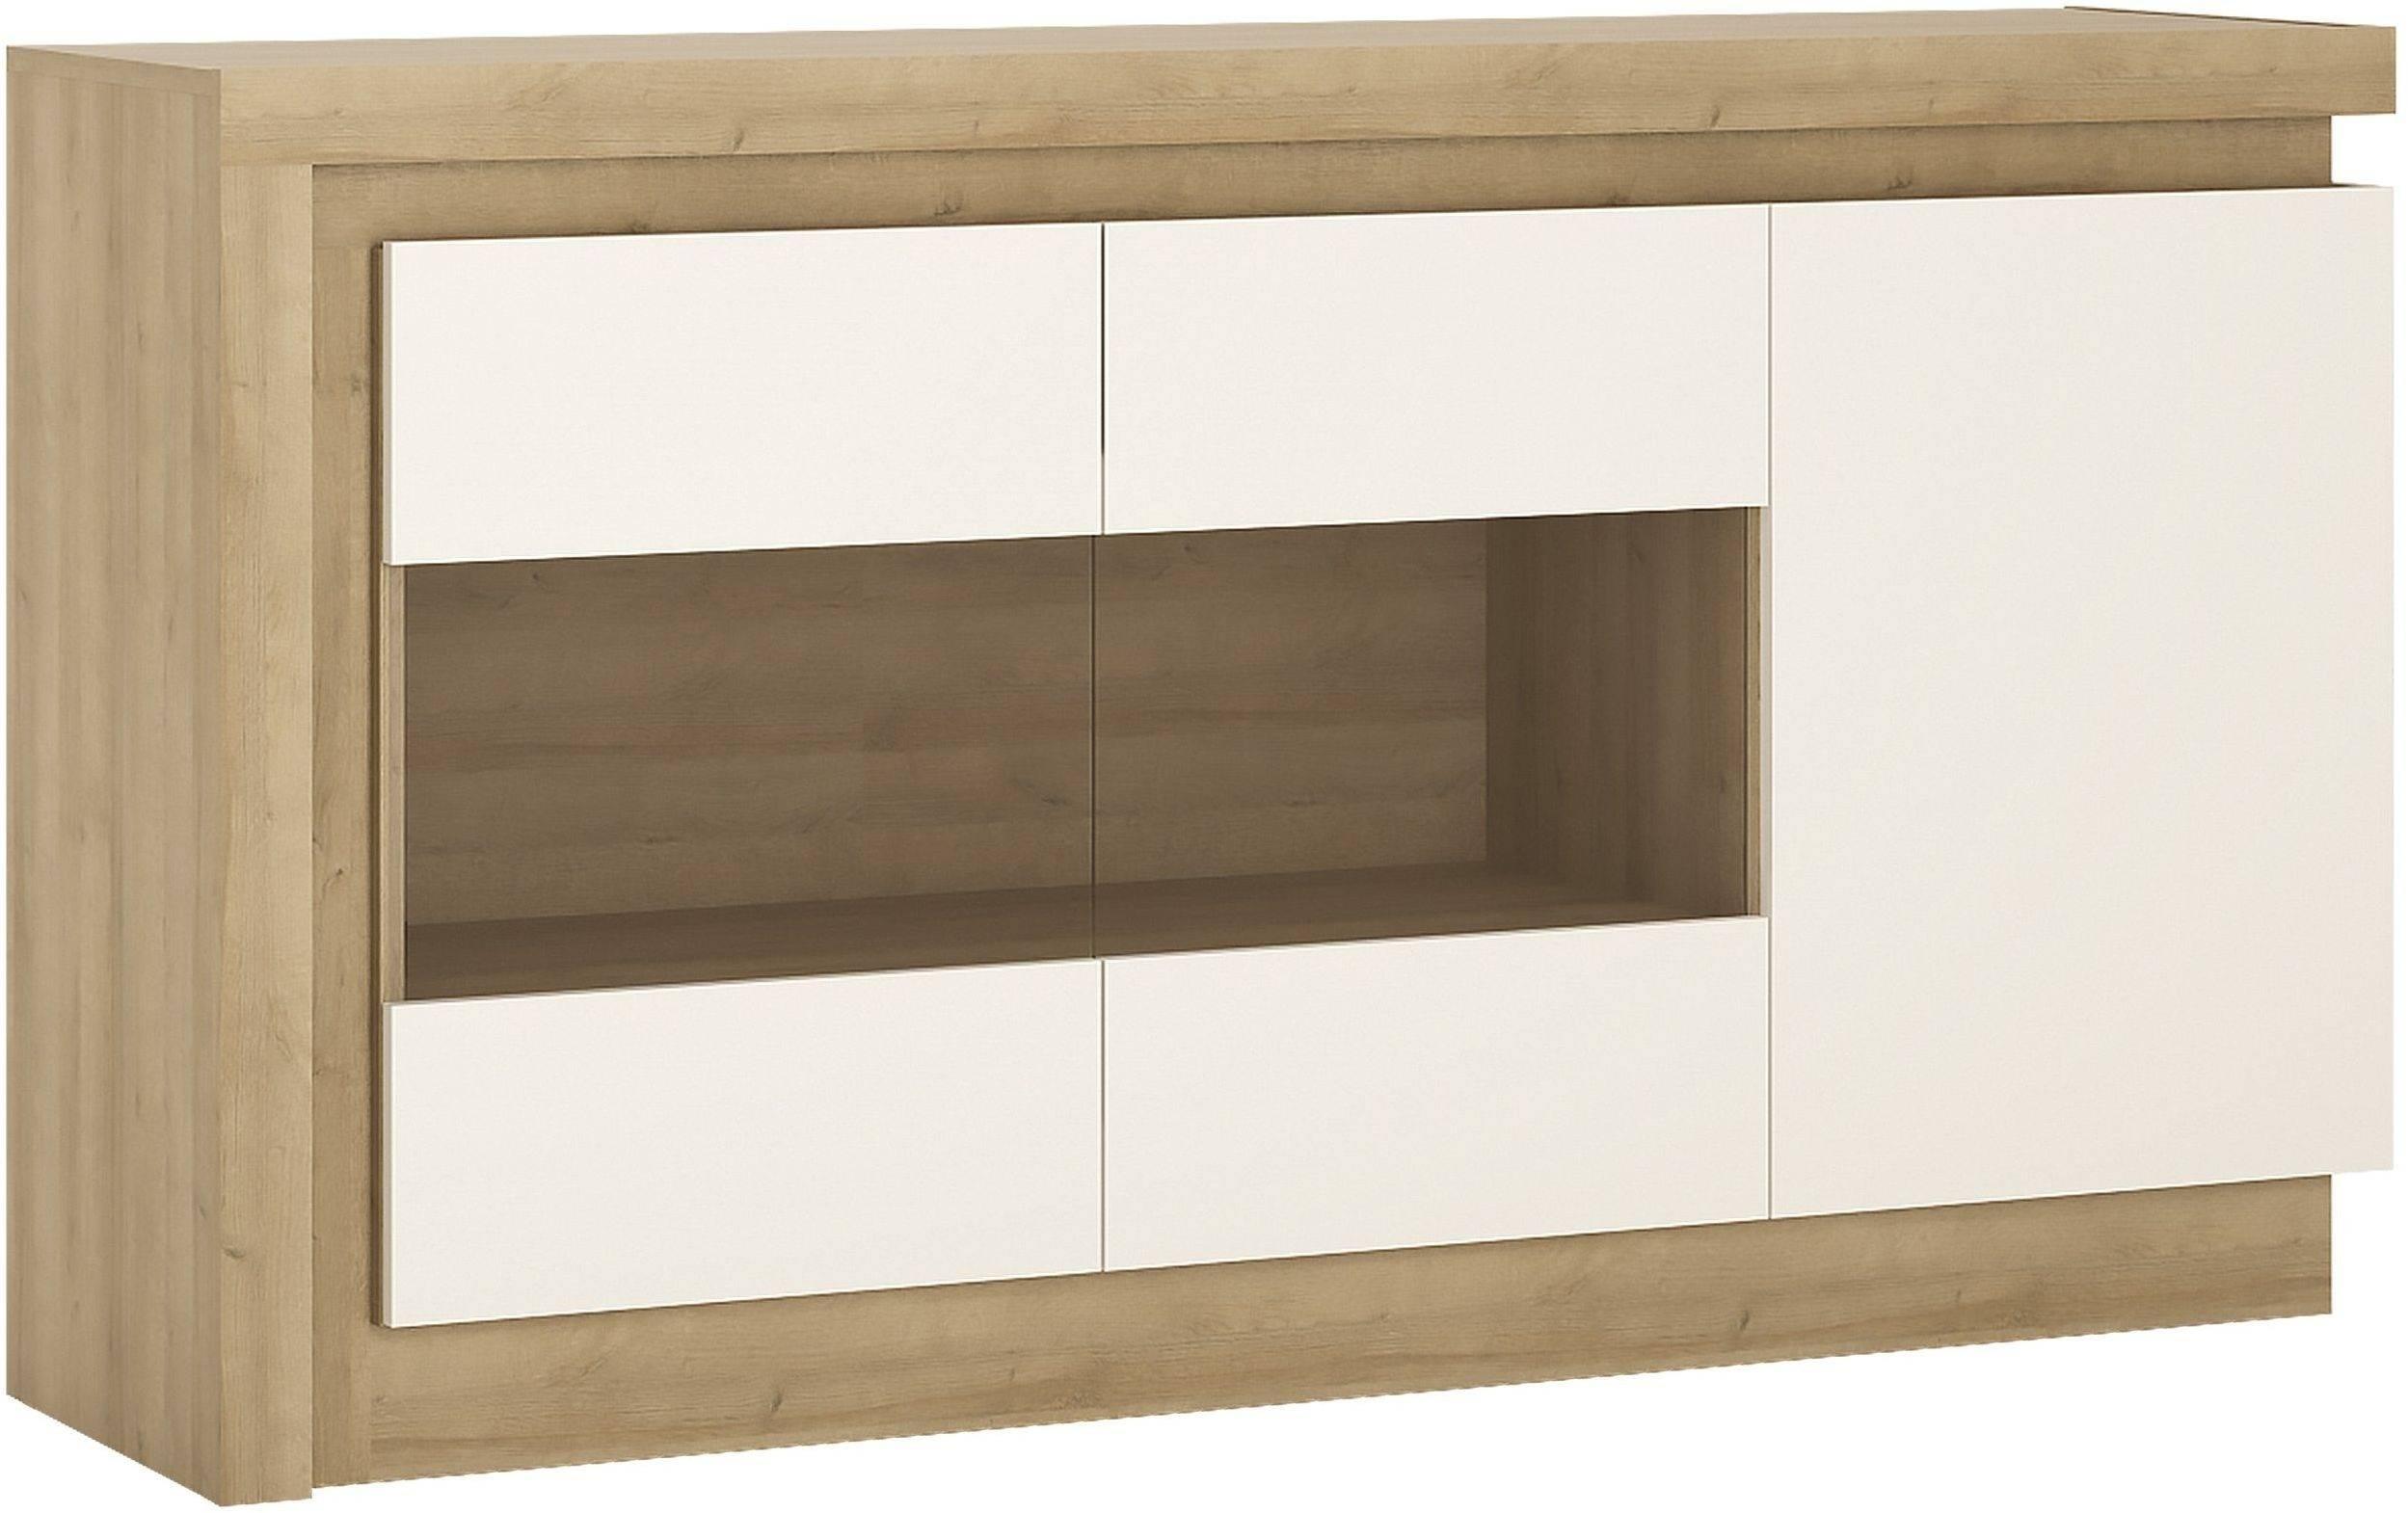 Buy Lyon Riviera Oak And White High Gloss Sideboard – 3 Door Throughout Cheap White High Gloss Sideboards (View 14 of 15)